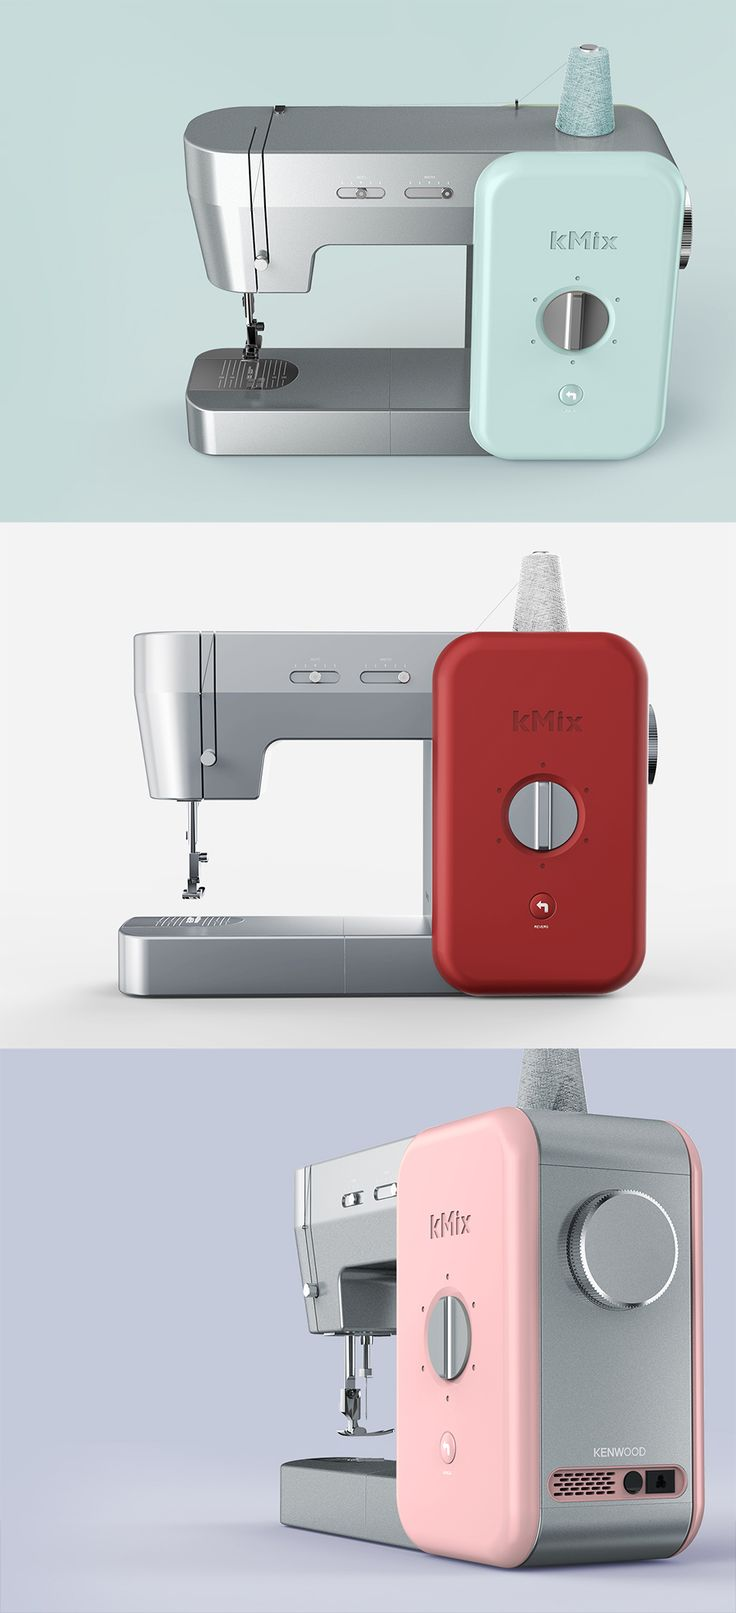 PDF HAUS_ Republic of Korea Design Academy / Product design / Industrial design / 工业设计 / 产品设计/ 空气净化器 / 산업디자인 / sewing machie / kmix / kenwood